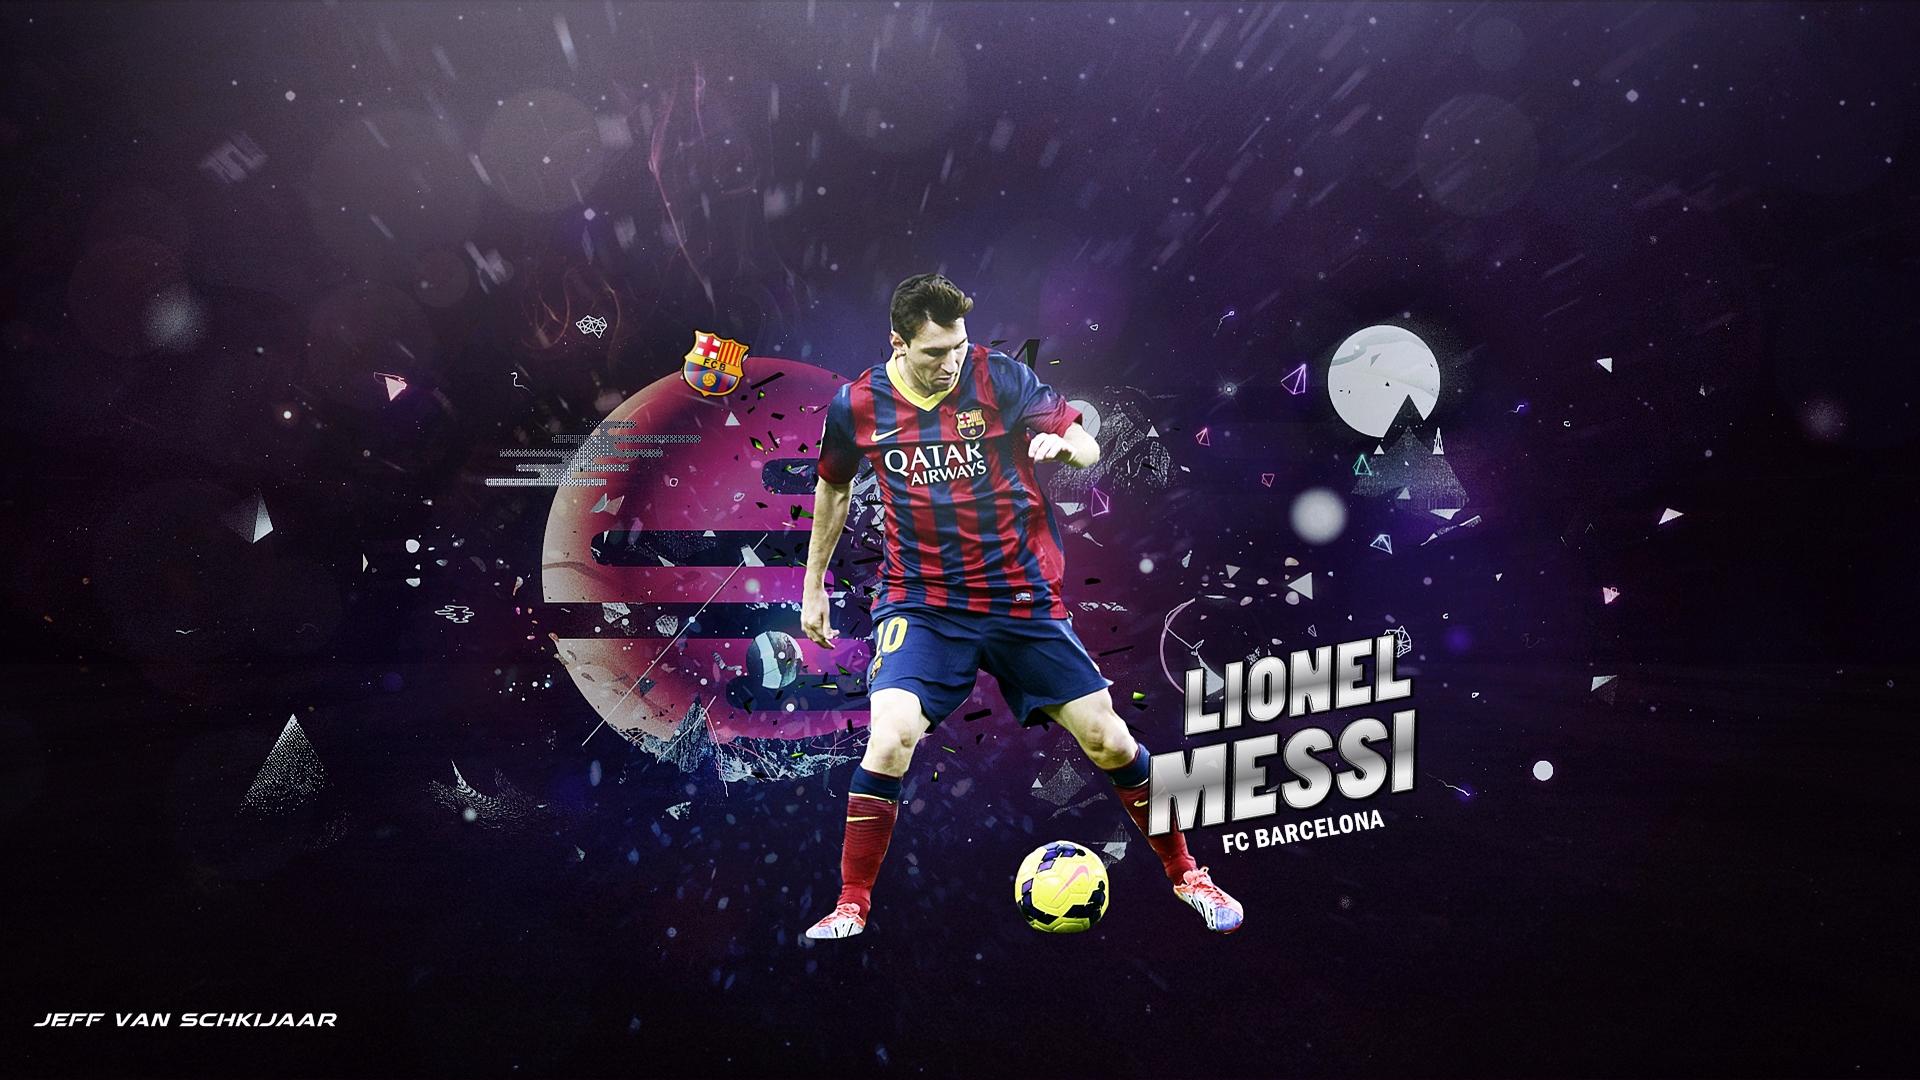 Lionel Messi FC Barcelona Wallpaper HD 2014 4 Football Wallpaper HD 1920x1080